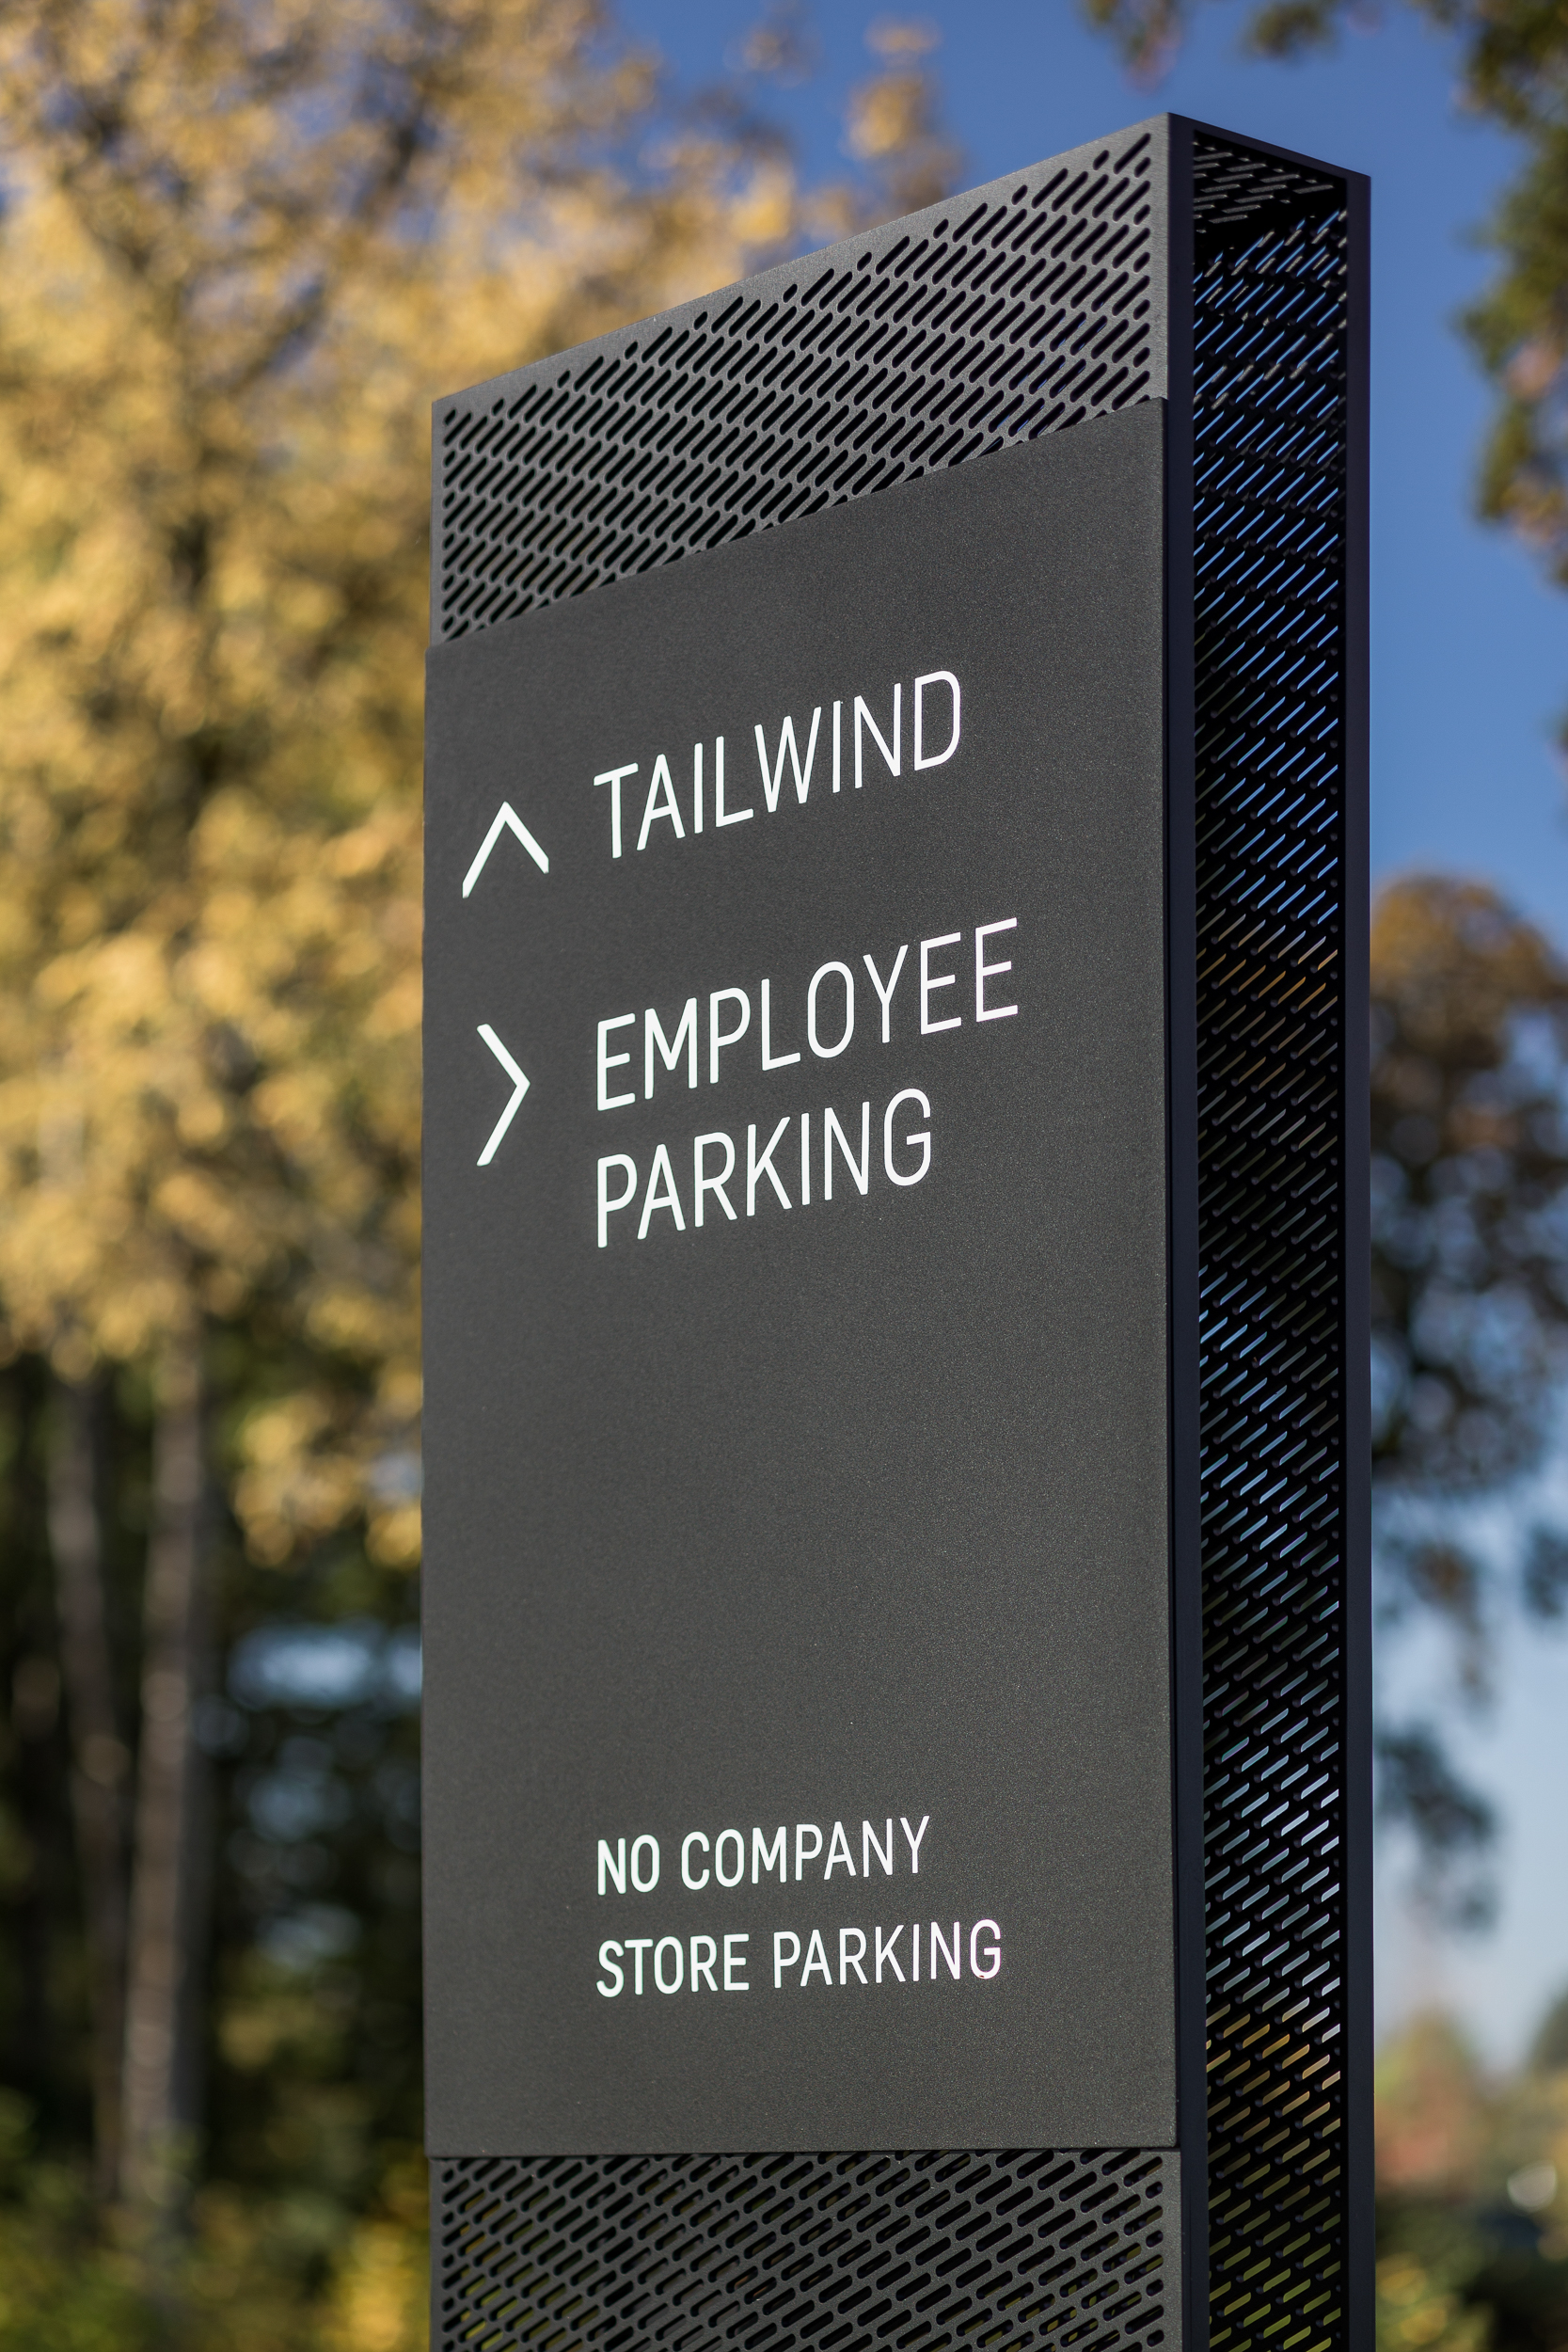 16-Tailwind-signage-JoshPartee-9425rev.jpg